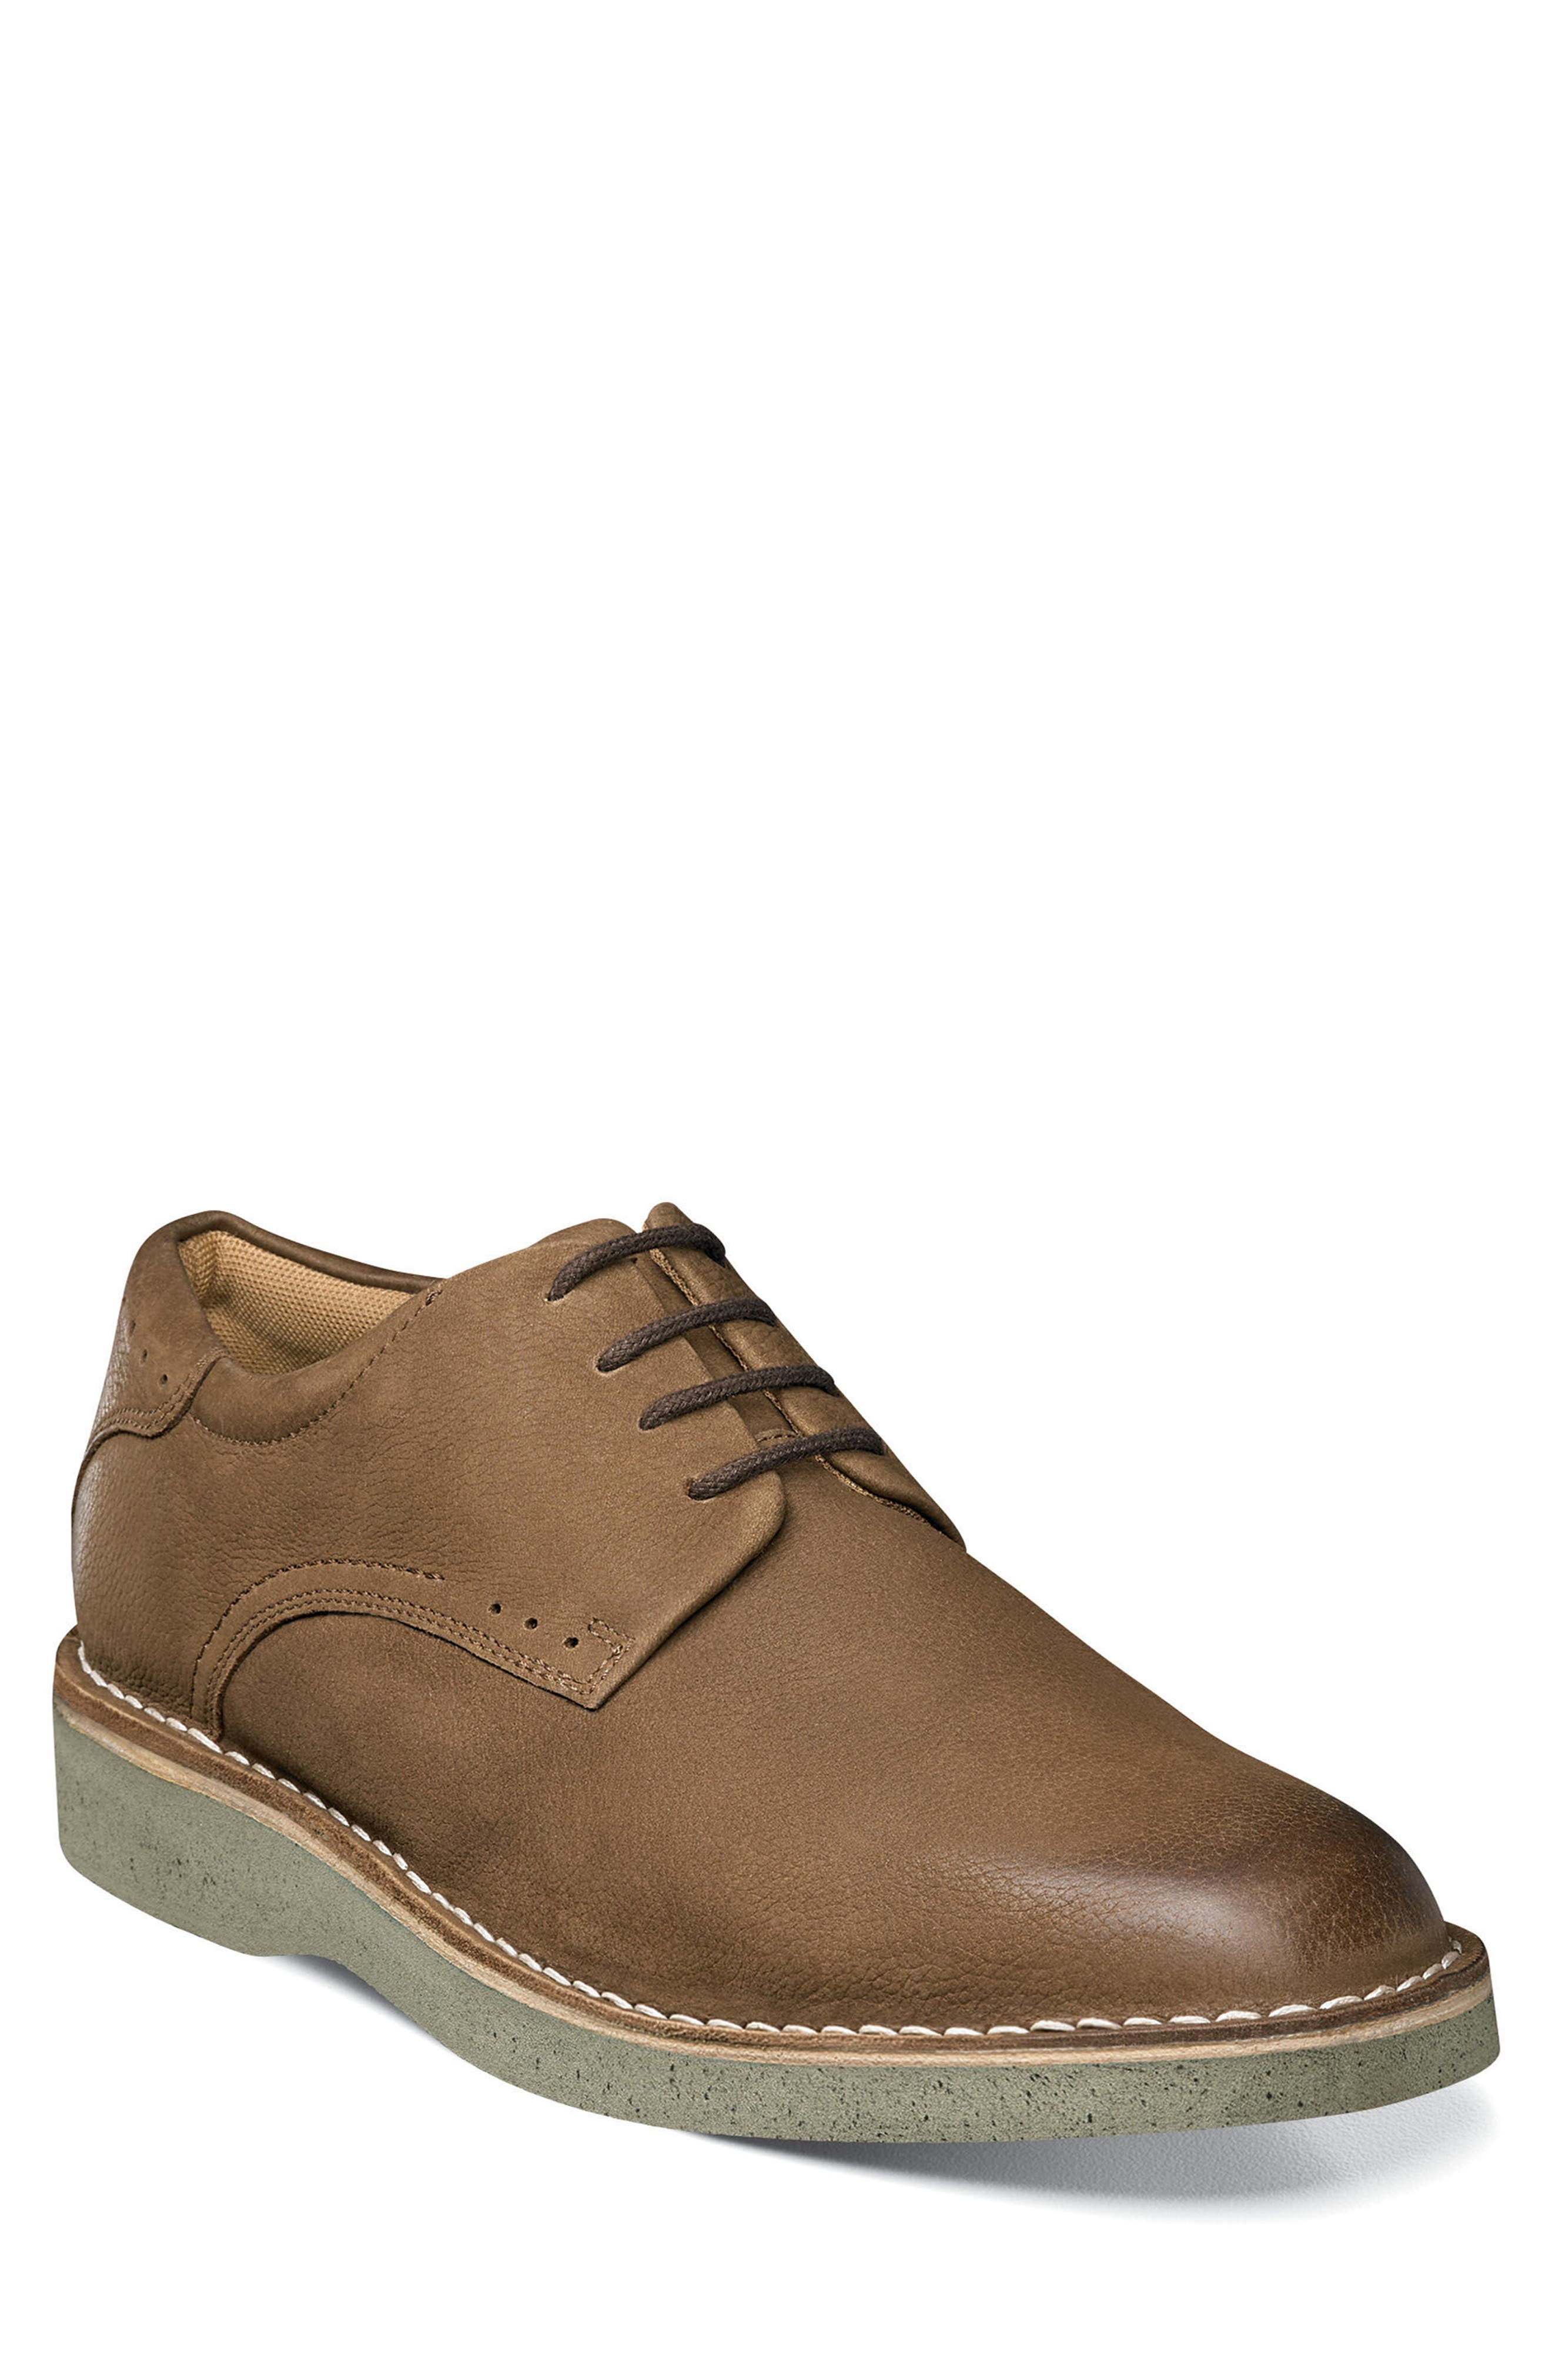 Navigator Plain Toe Oxford,                             Main thumbnail 1, color,                             Cocoa Nubuck Leather